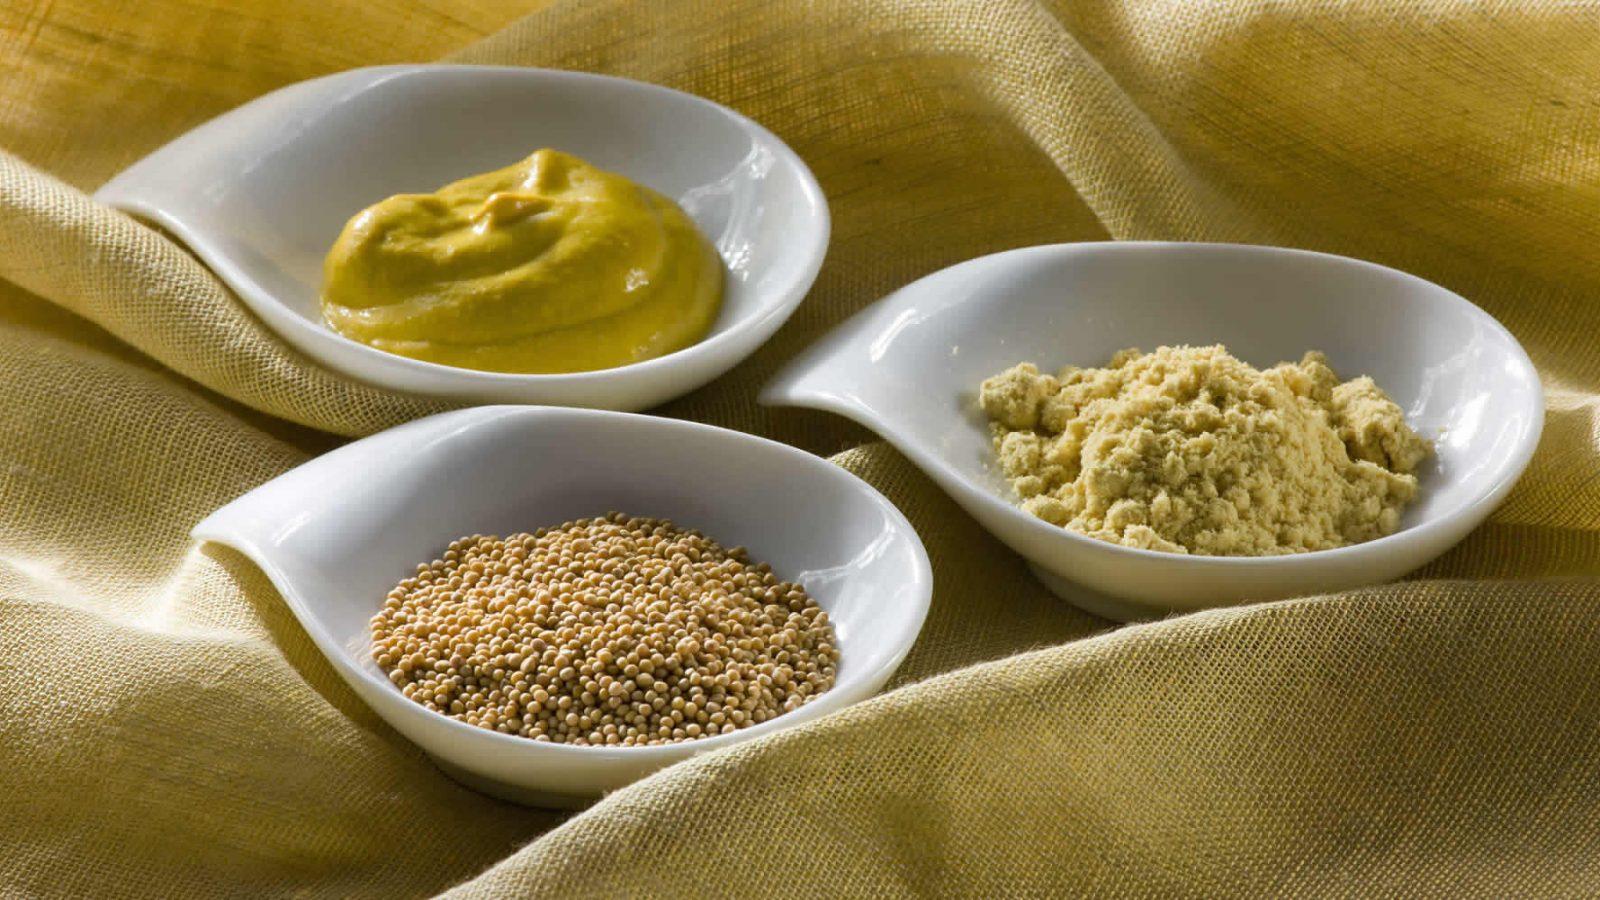 Mustard powder prepared mustard and whole grain